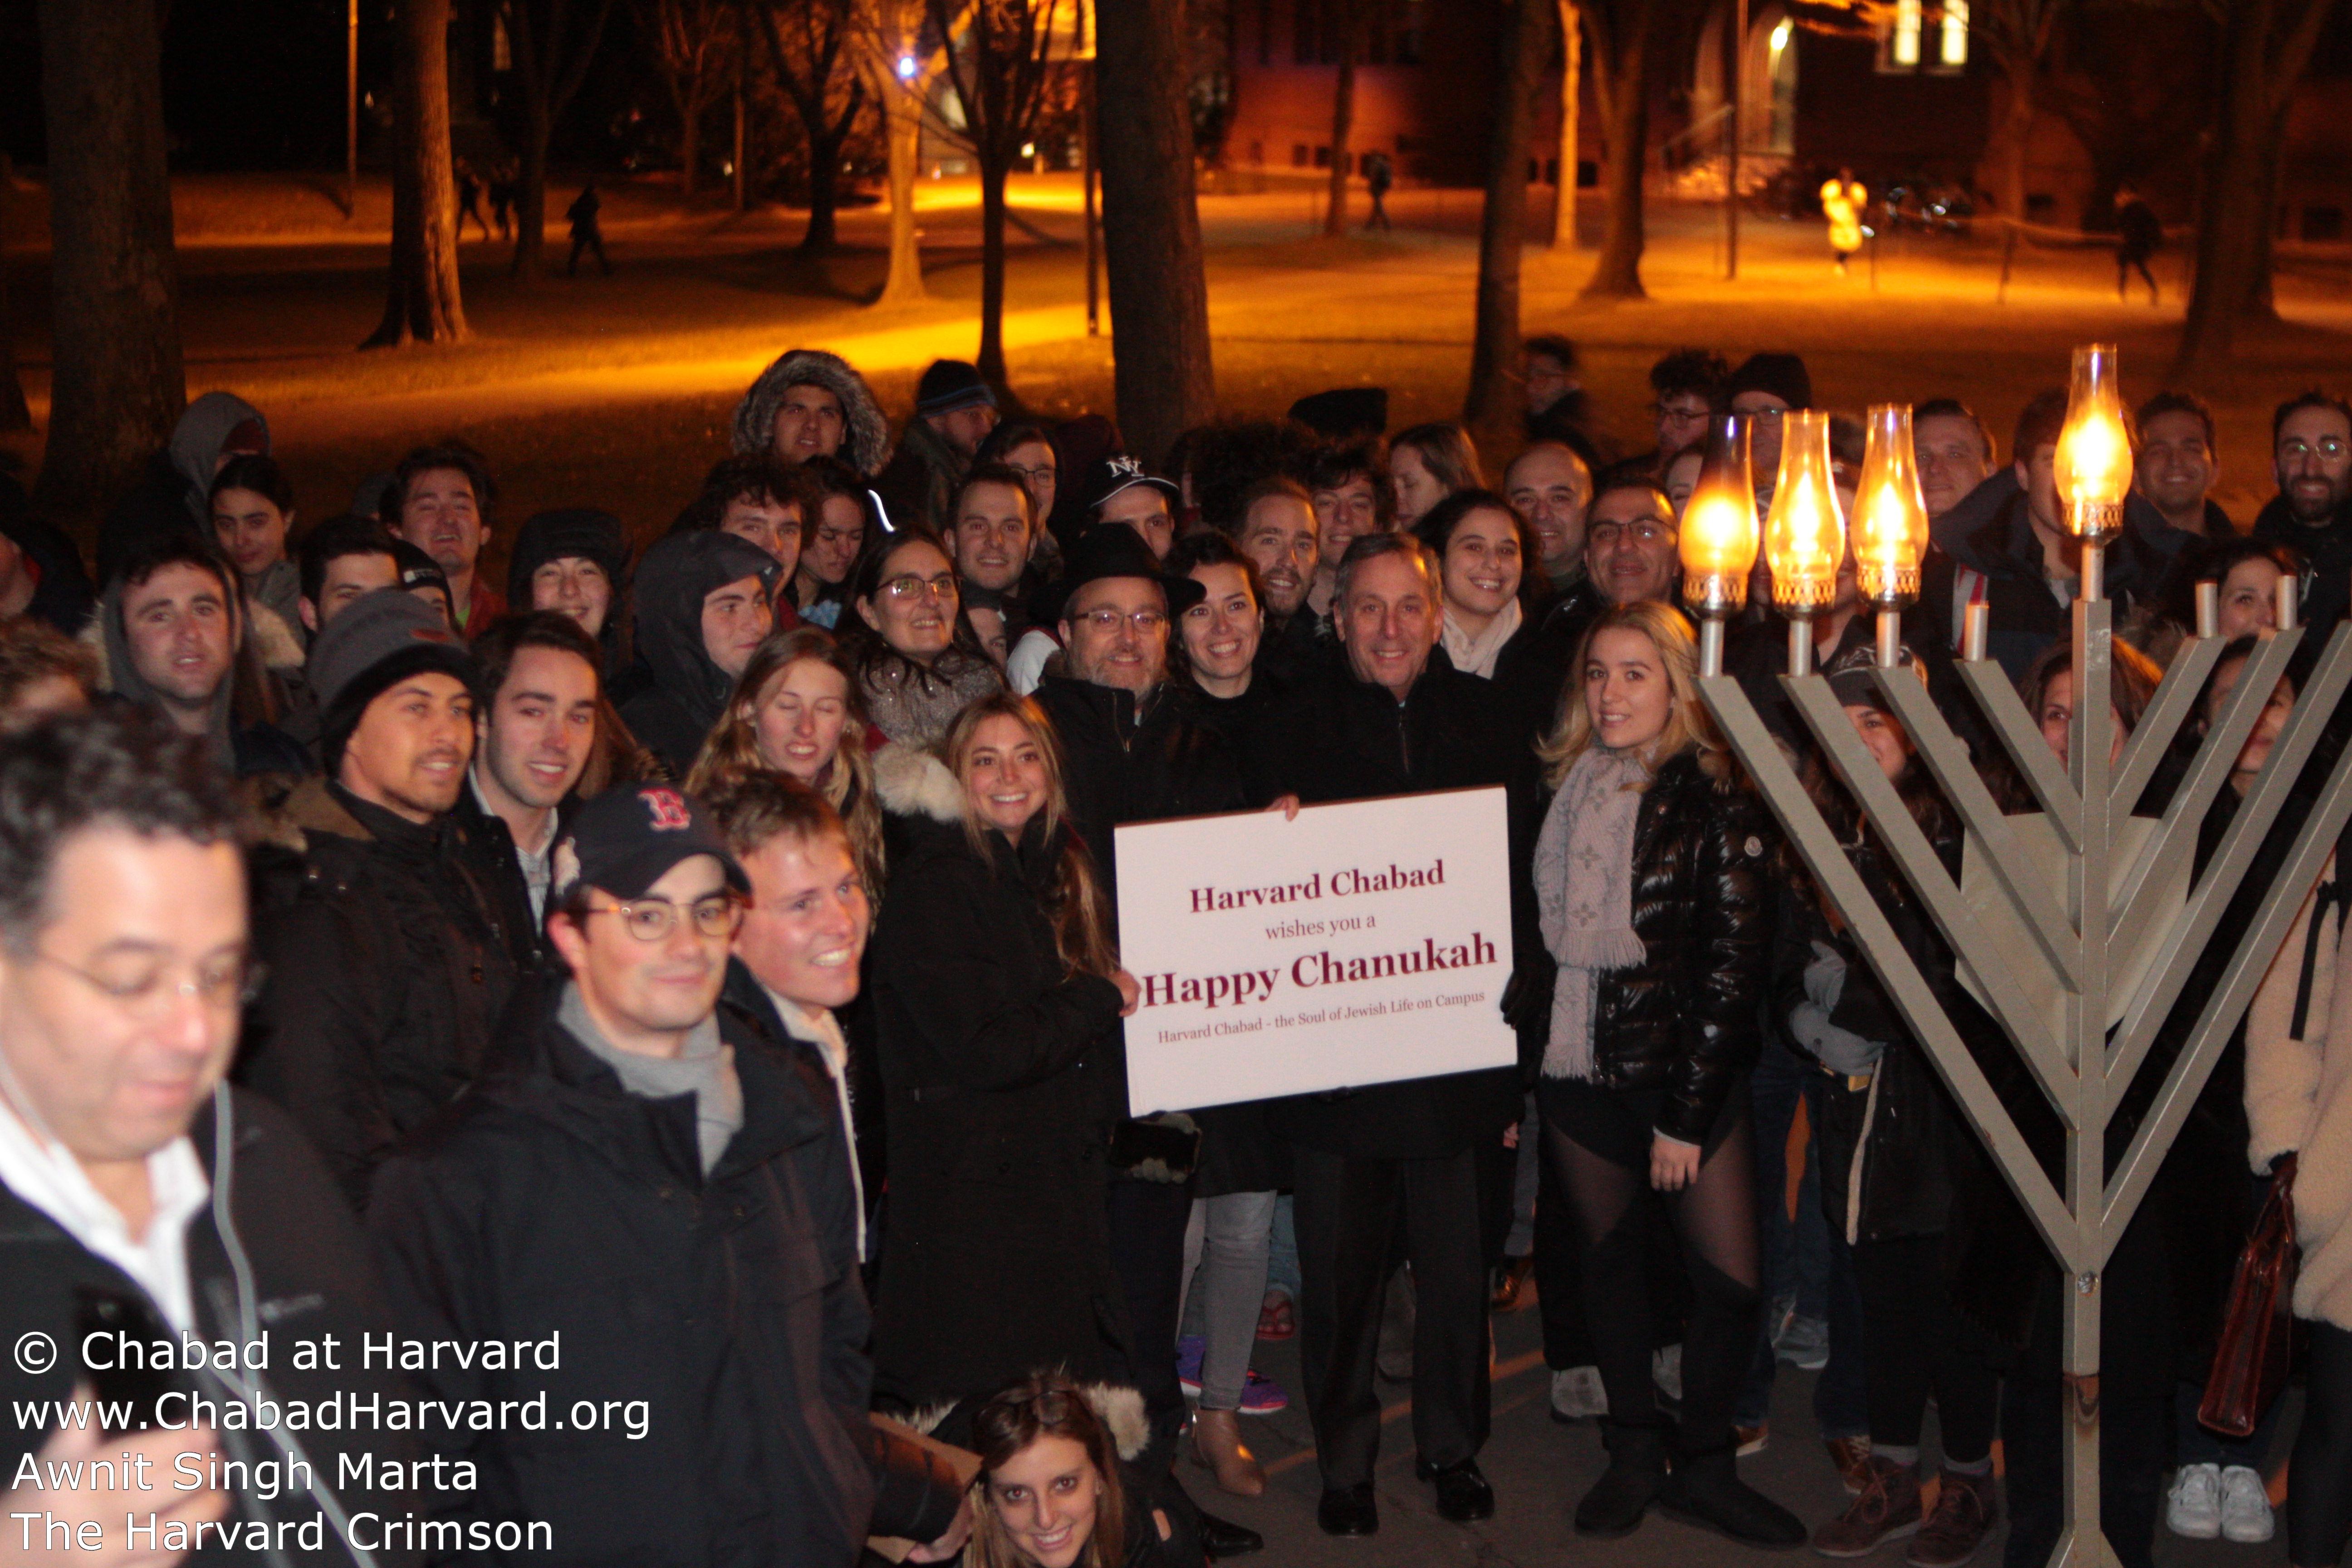 Harvard Chabad